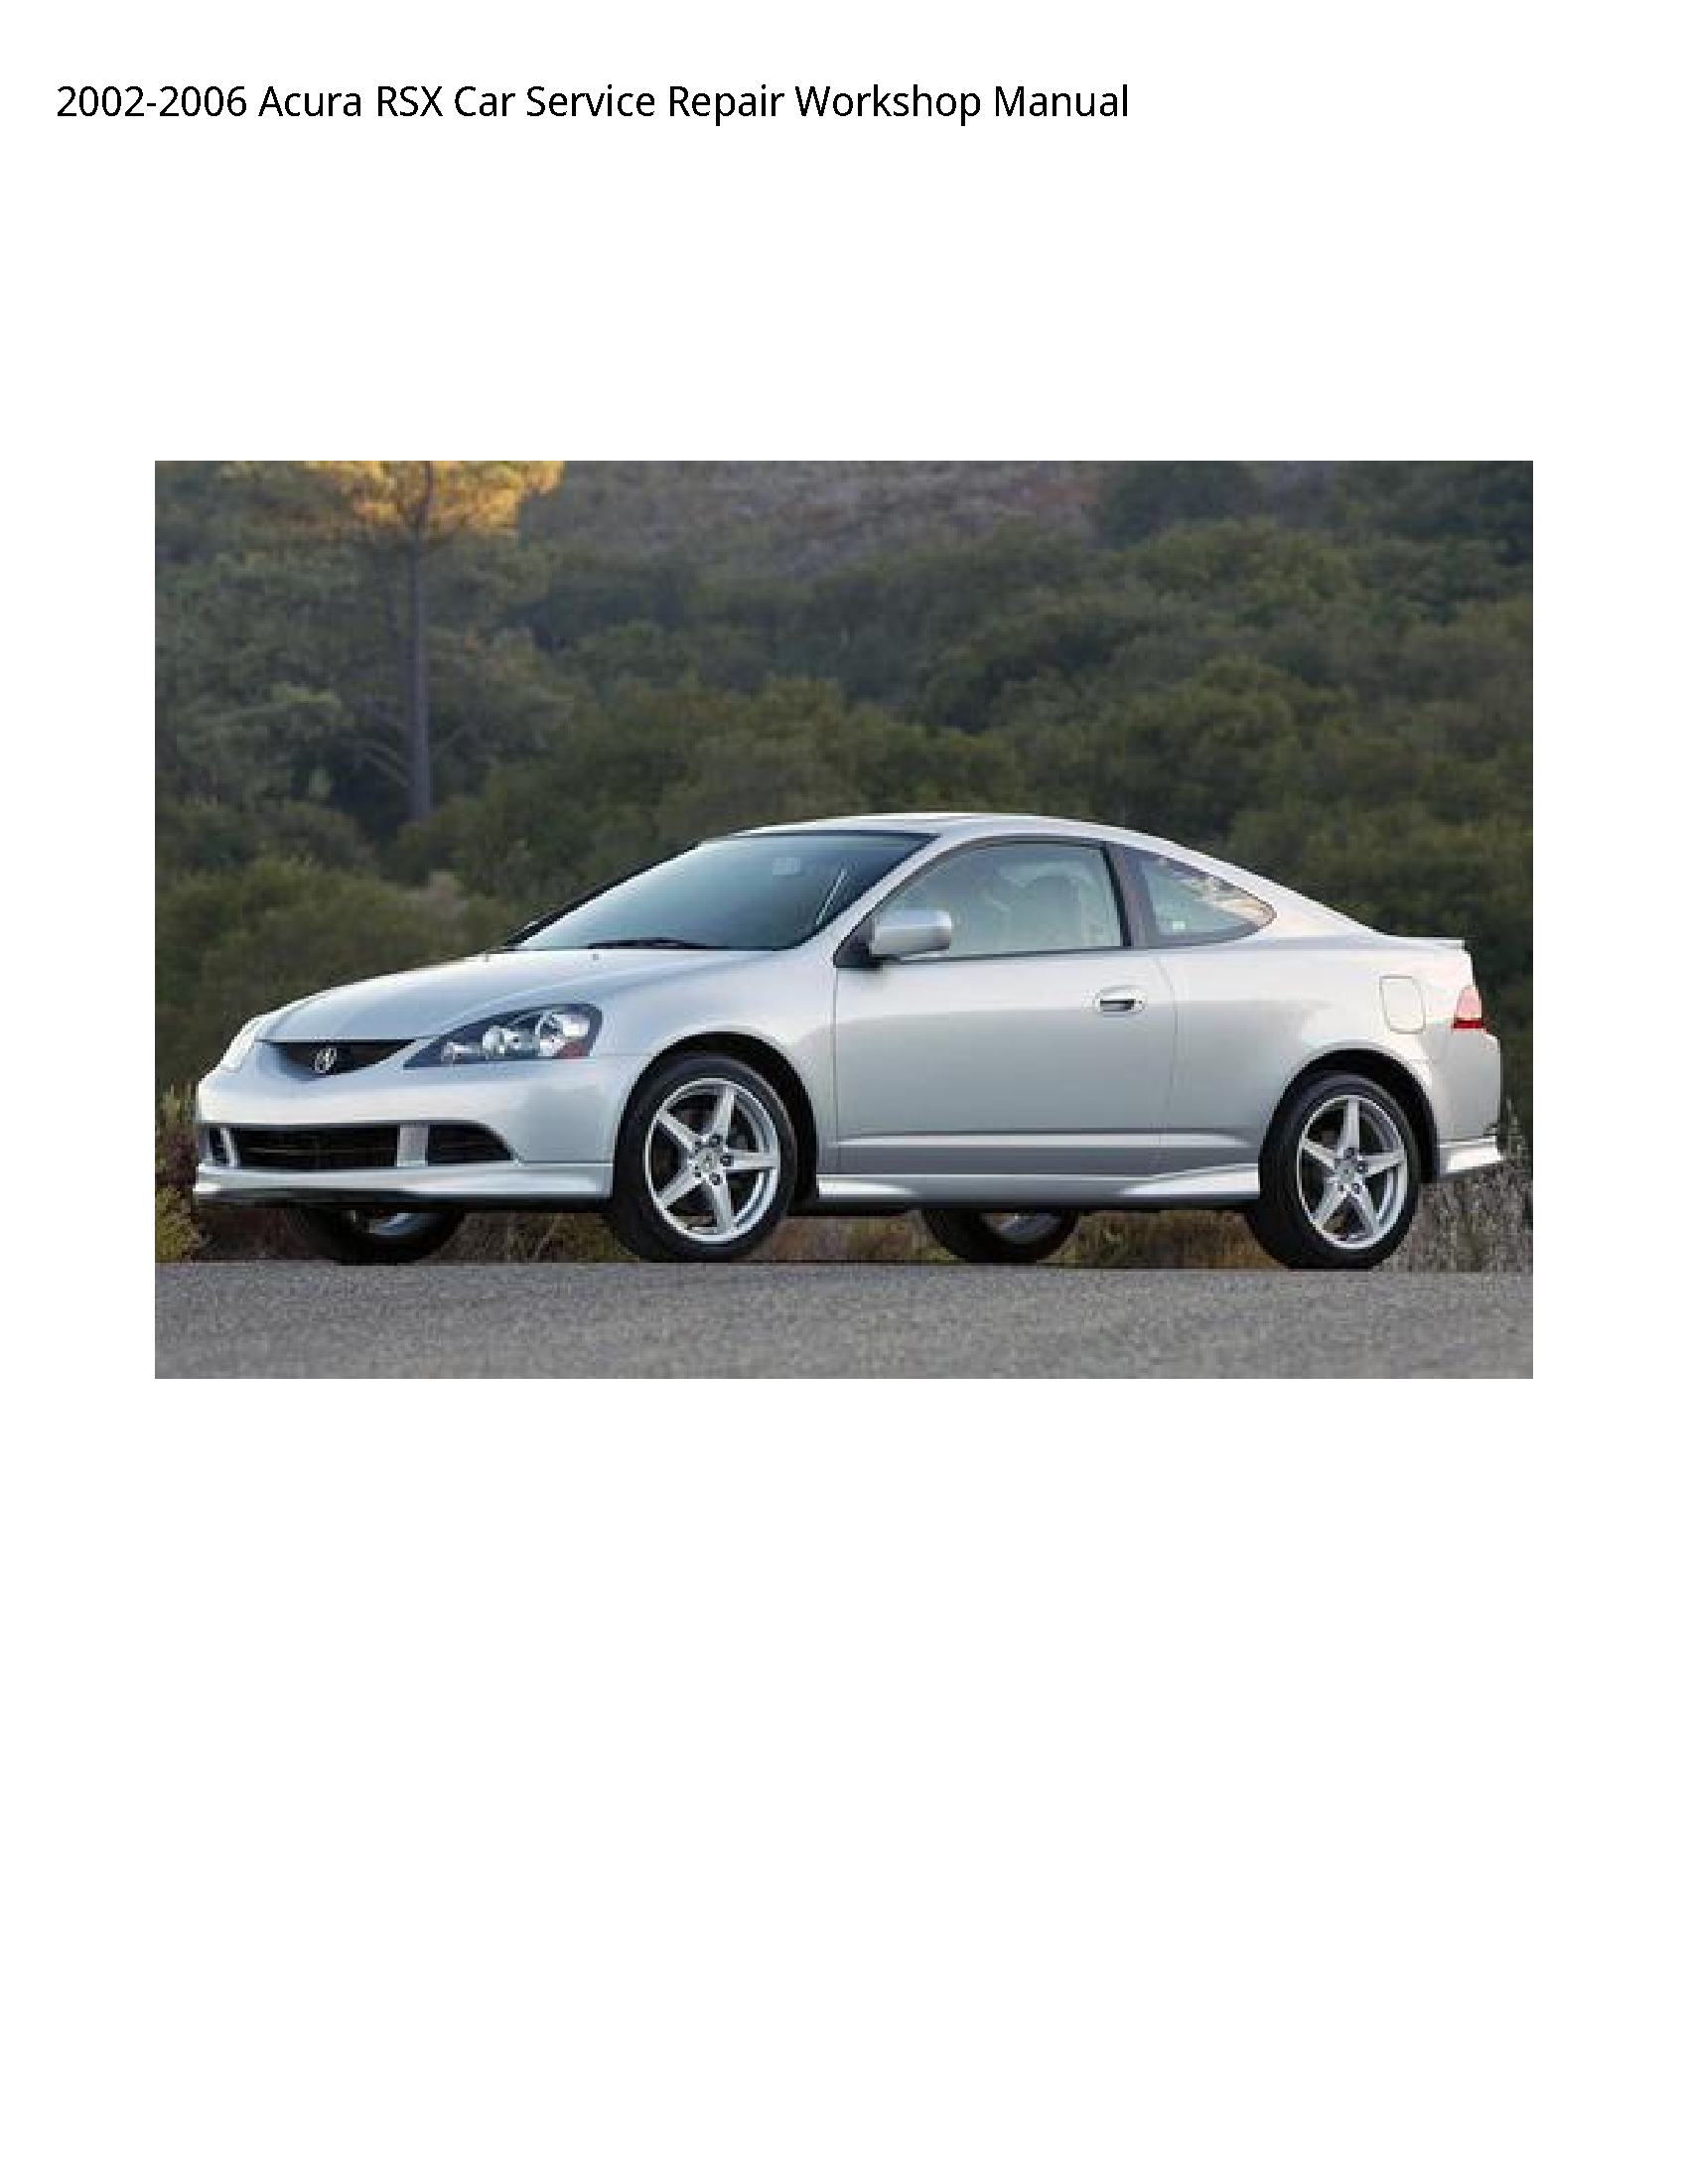 Acura RSX Car manual